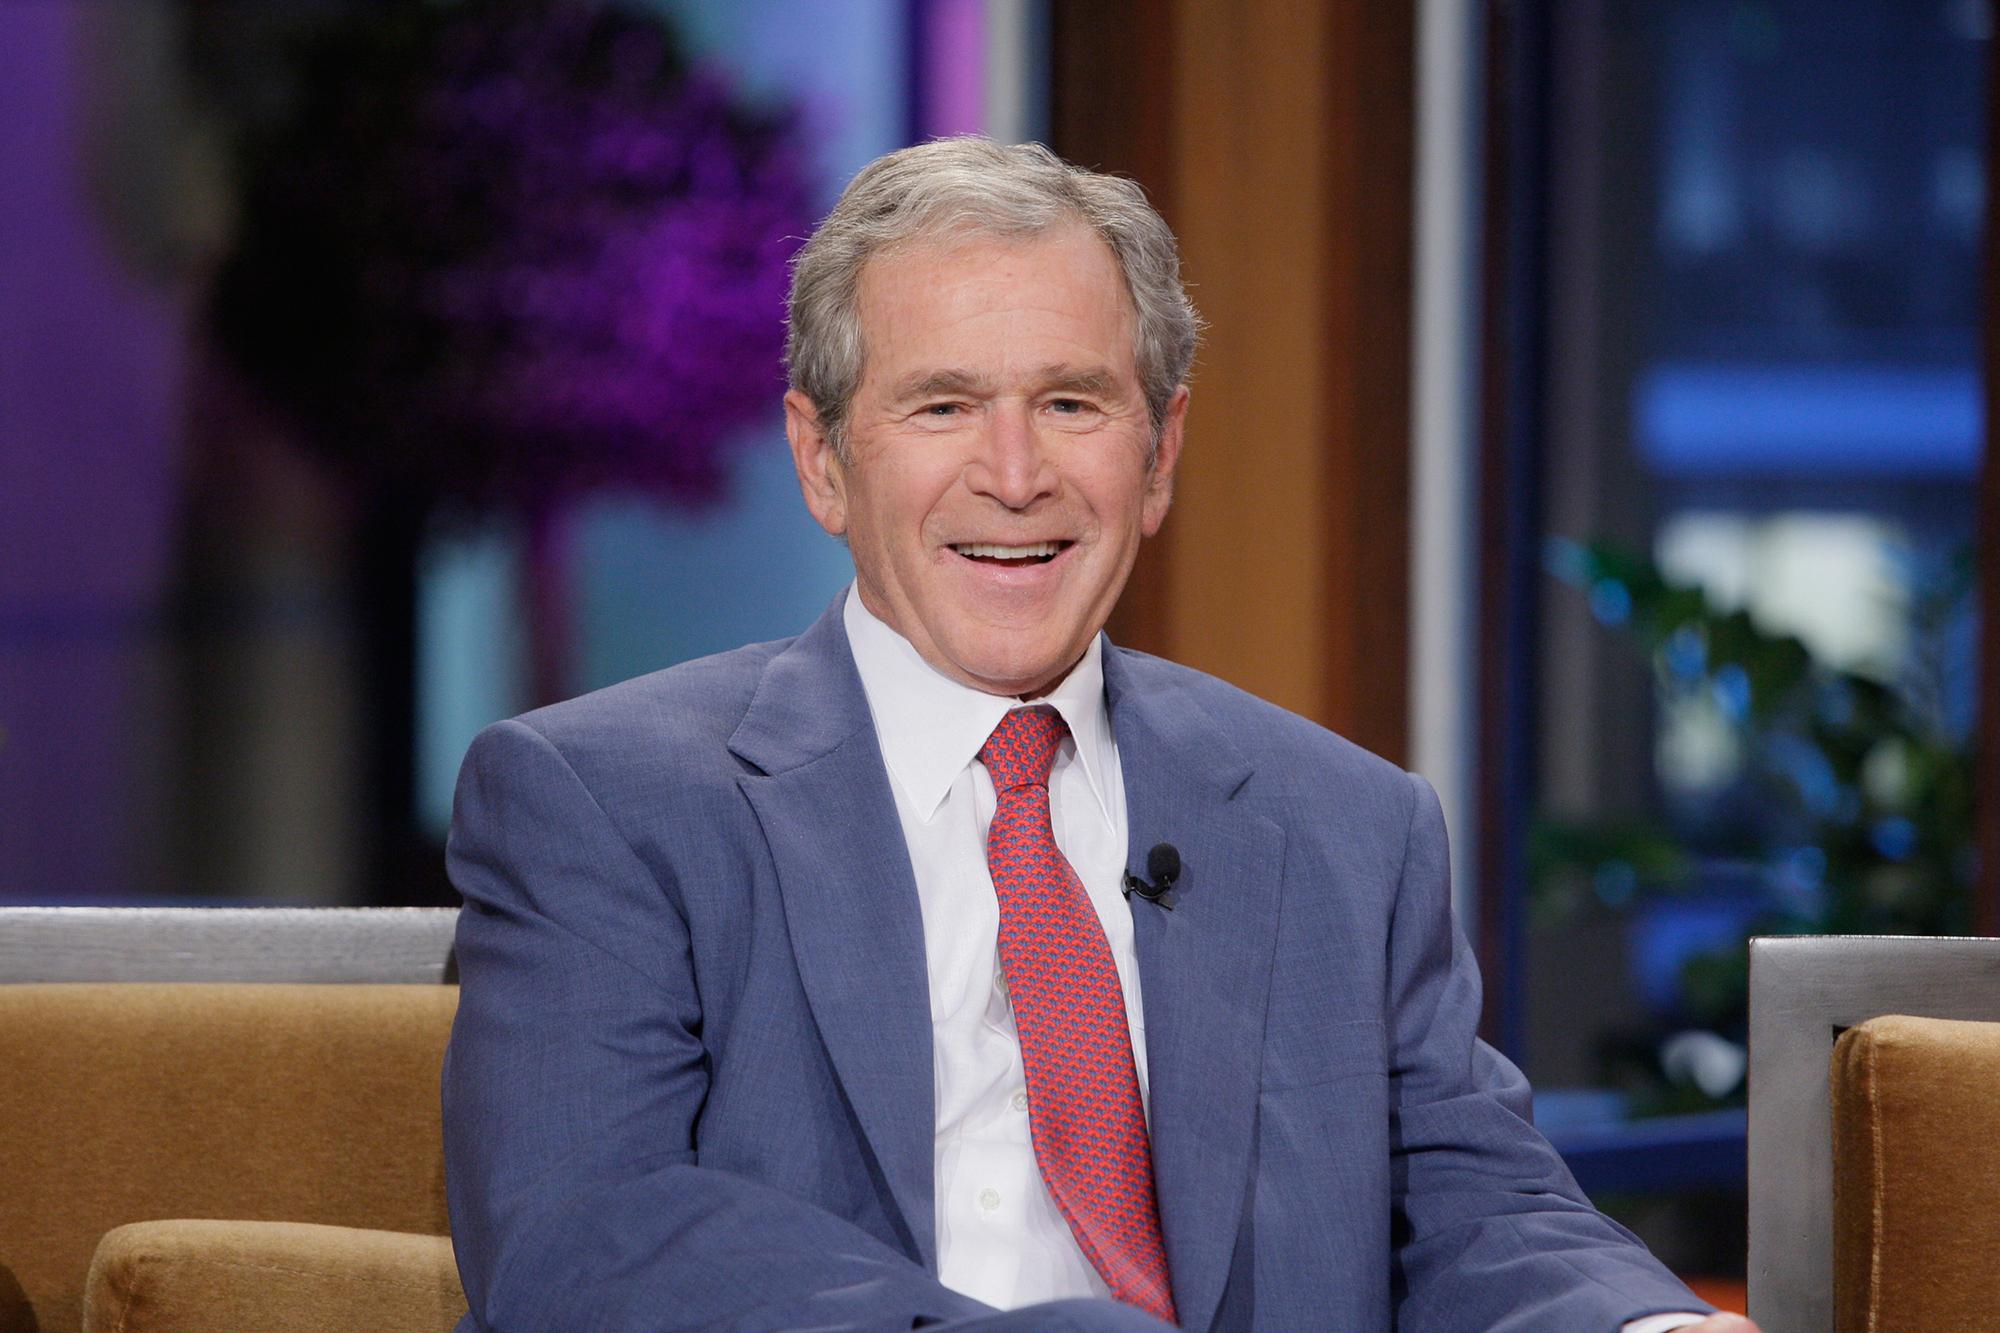 George W. Bush Was President of the Dance Floor at His Nephews Wedding